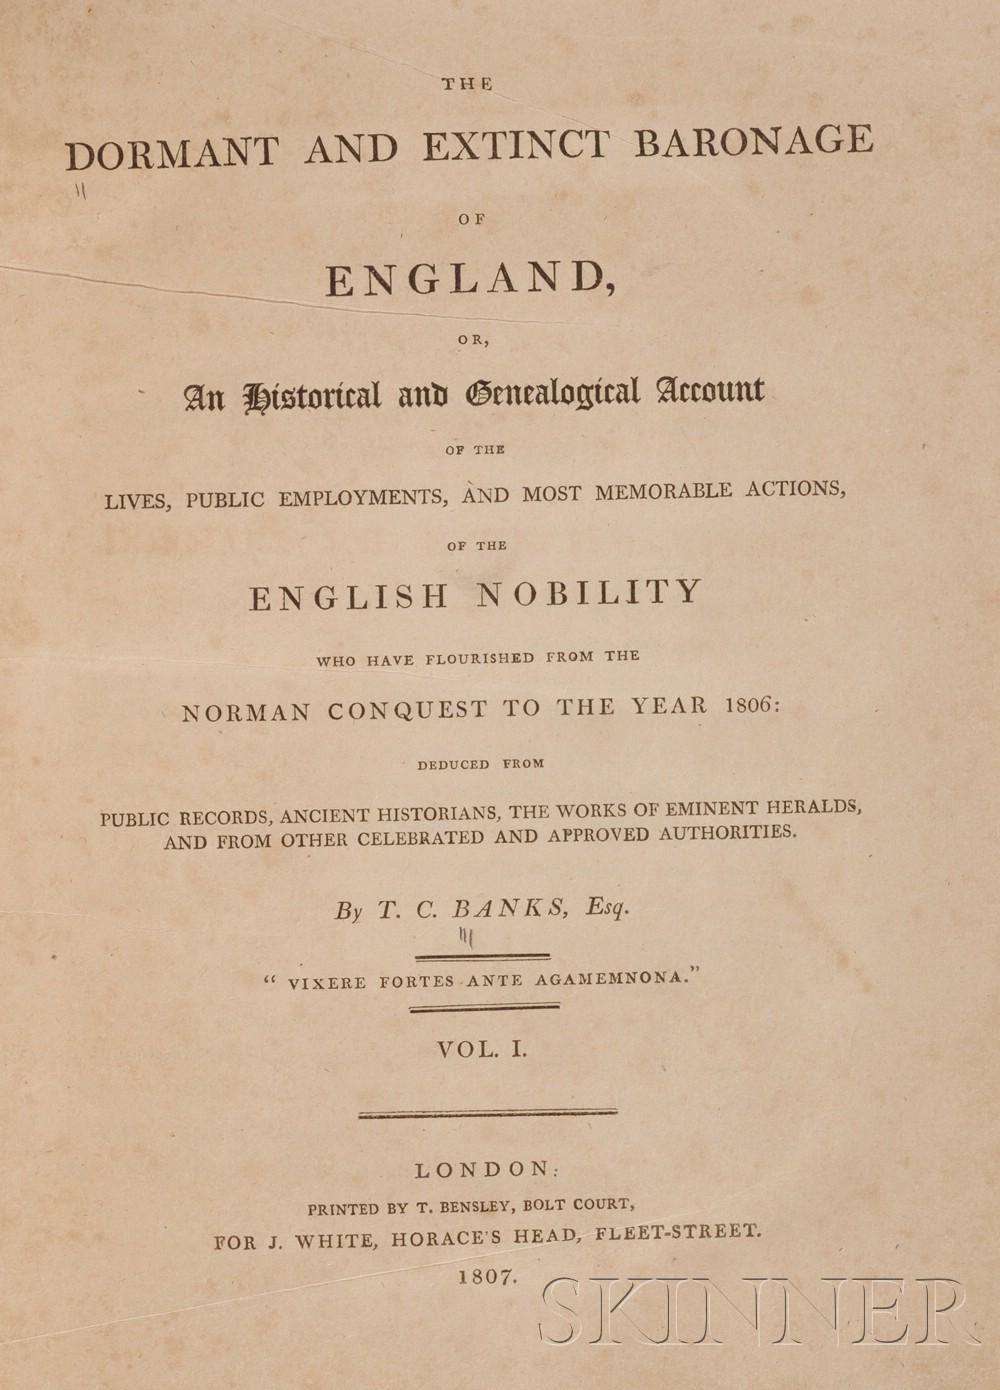 (Heraldry and Peerage), Banks, Thomas Christopher (1765-1854)